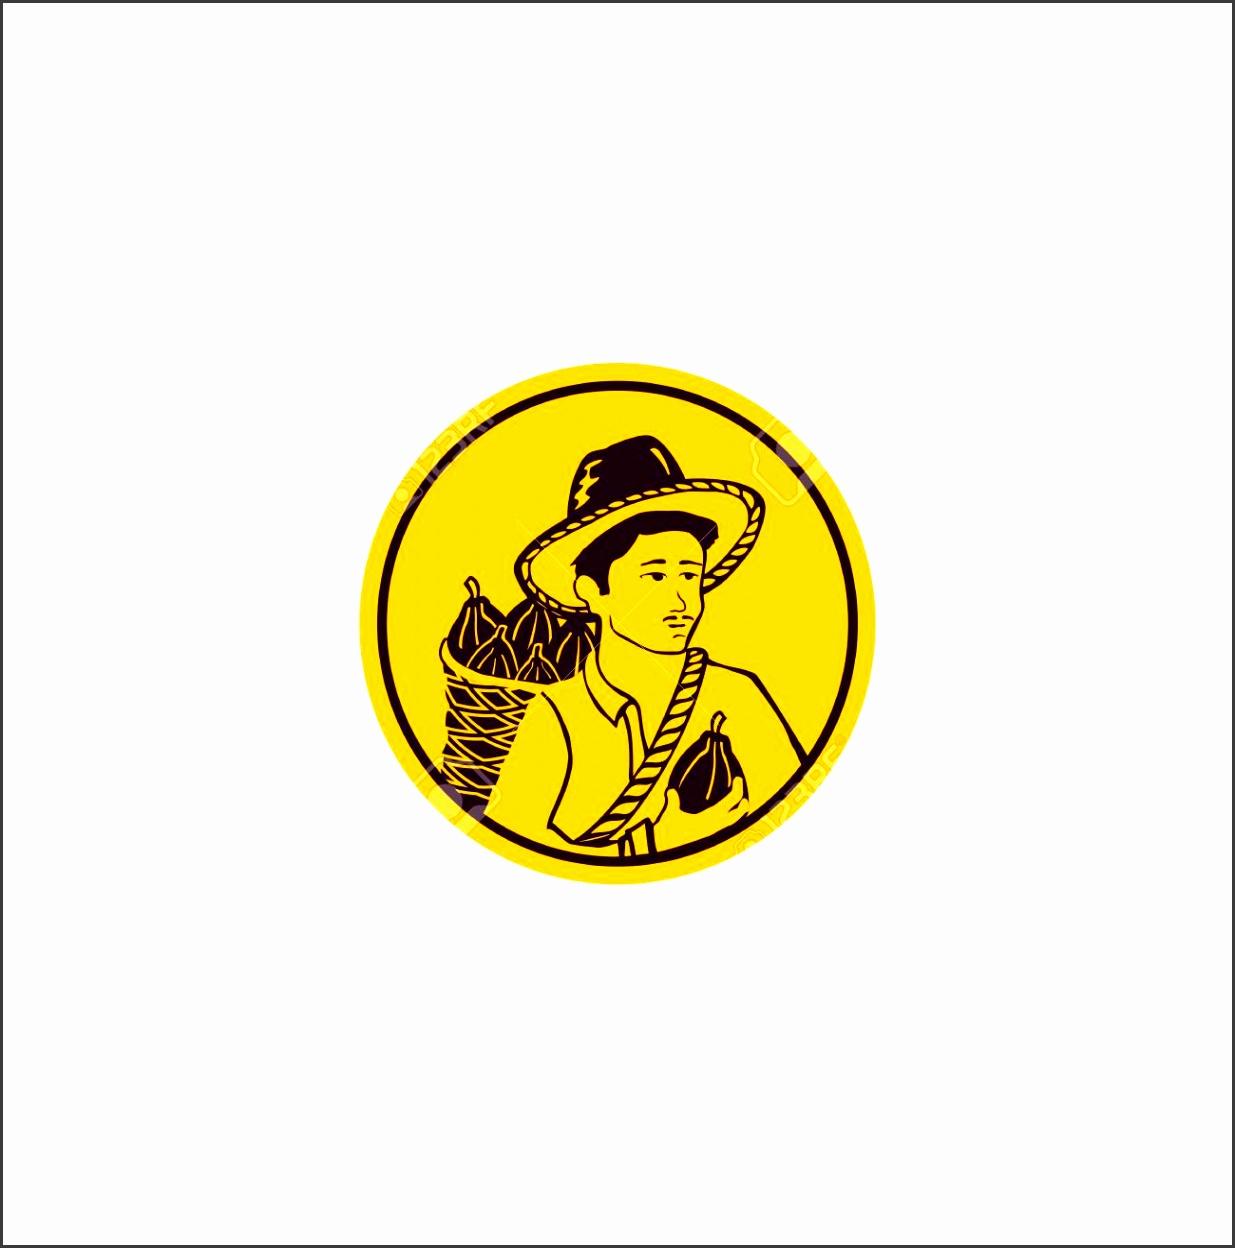 Farmer logo design template Harvest vector illustration Isolated human design Farmer yellow color